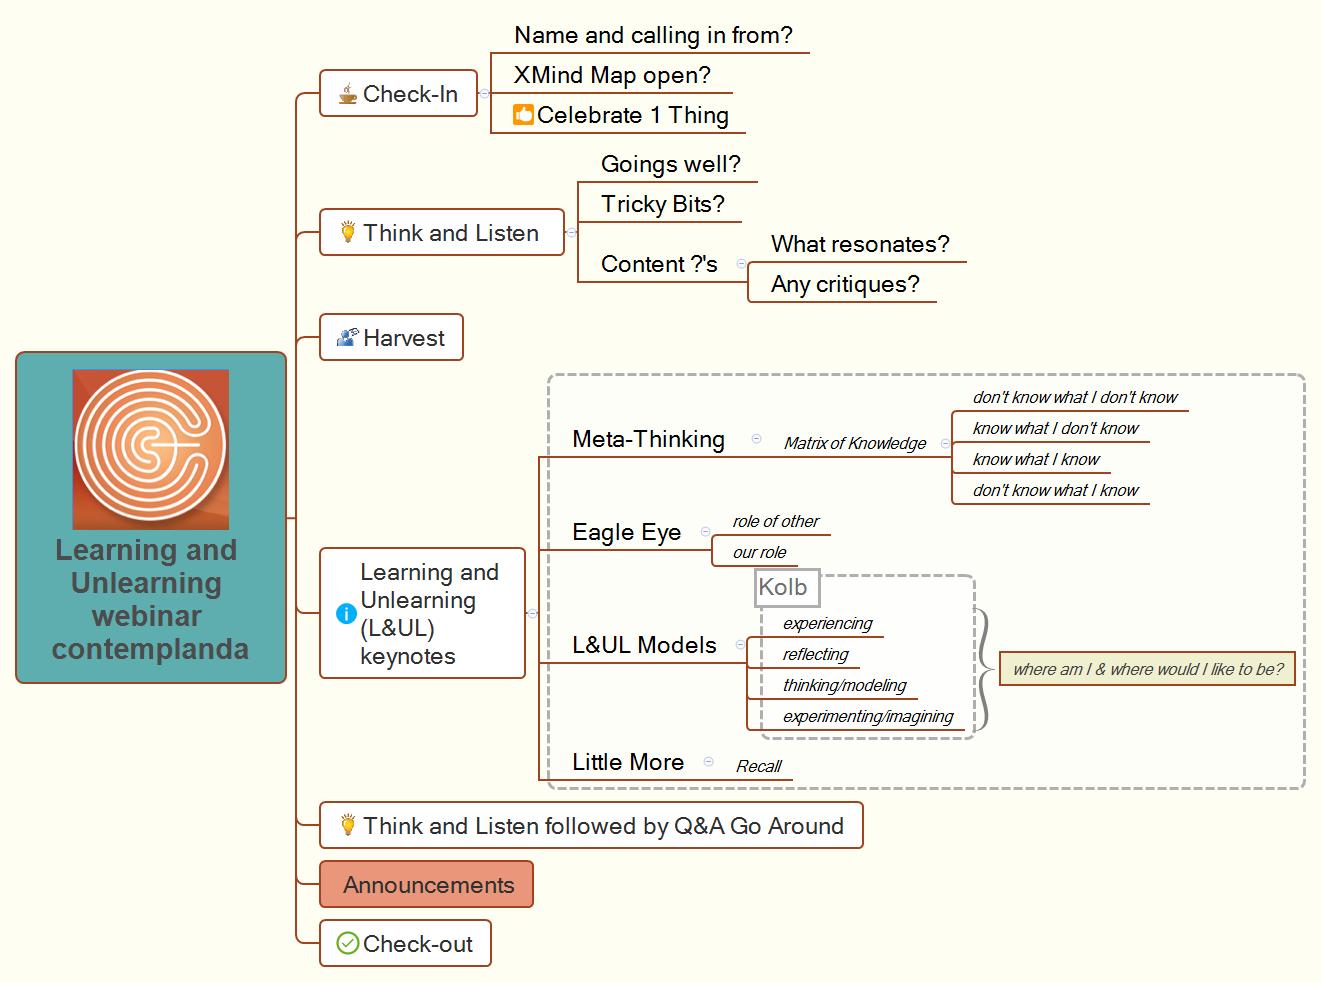 Learning and Unlearning Webinar Contemplanda